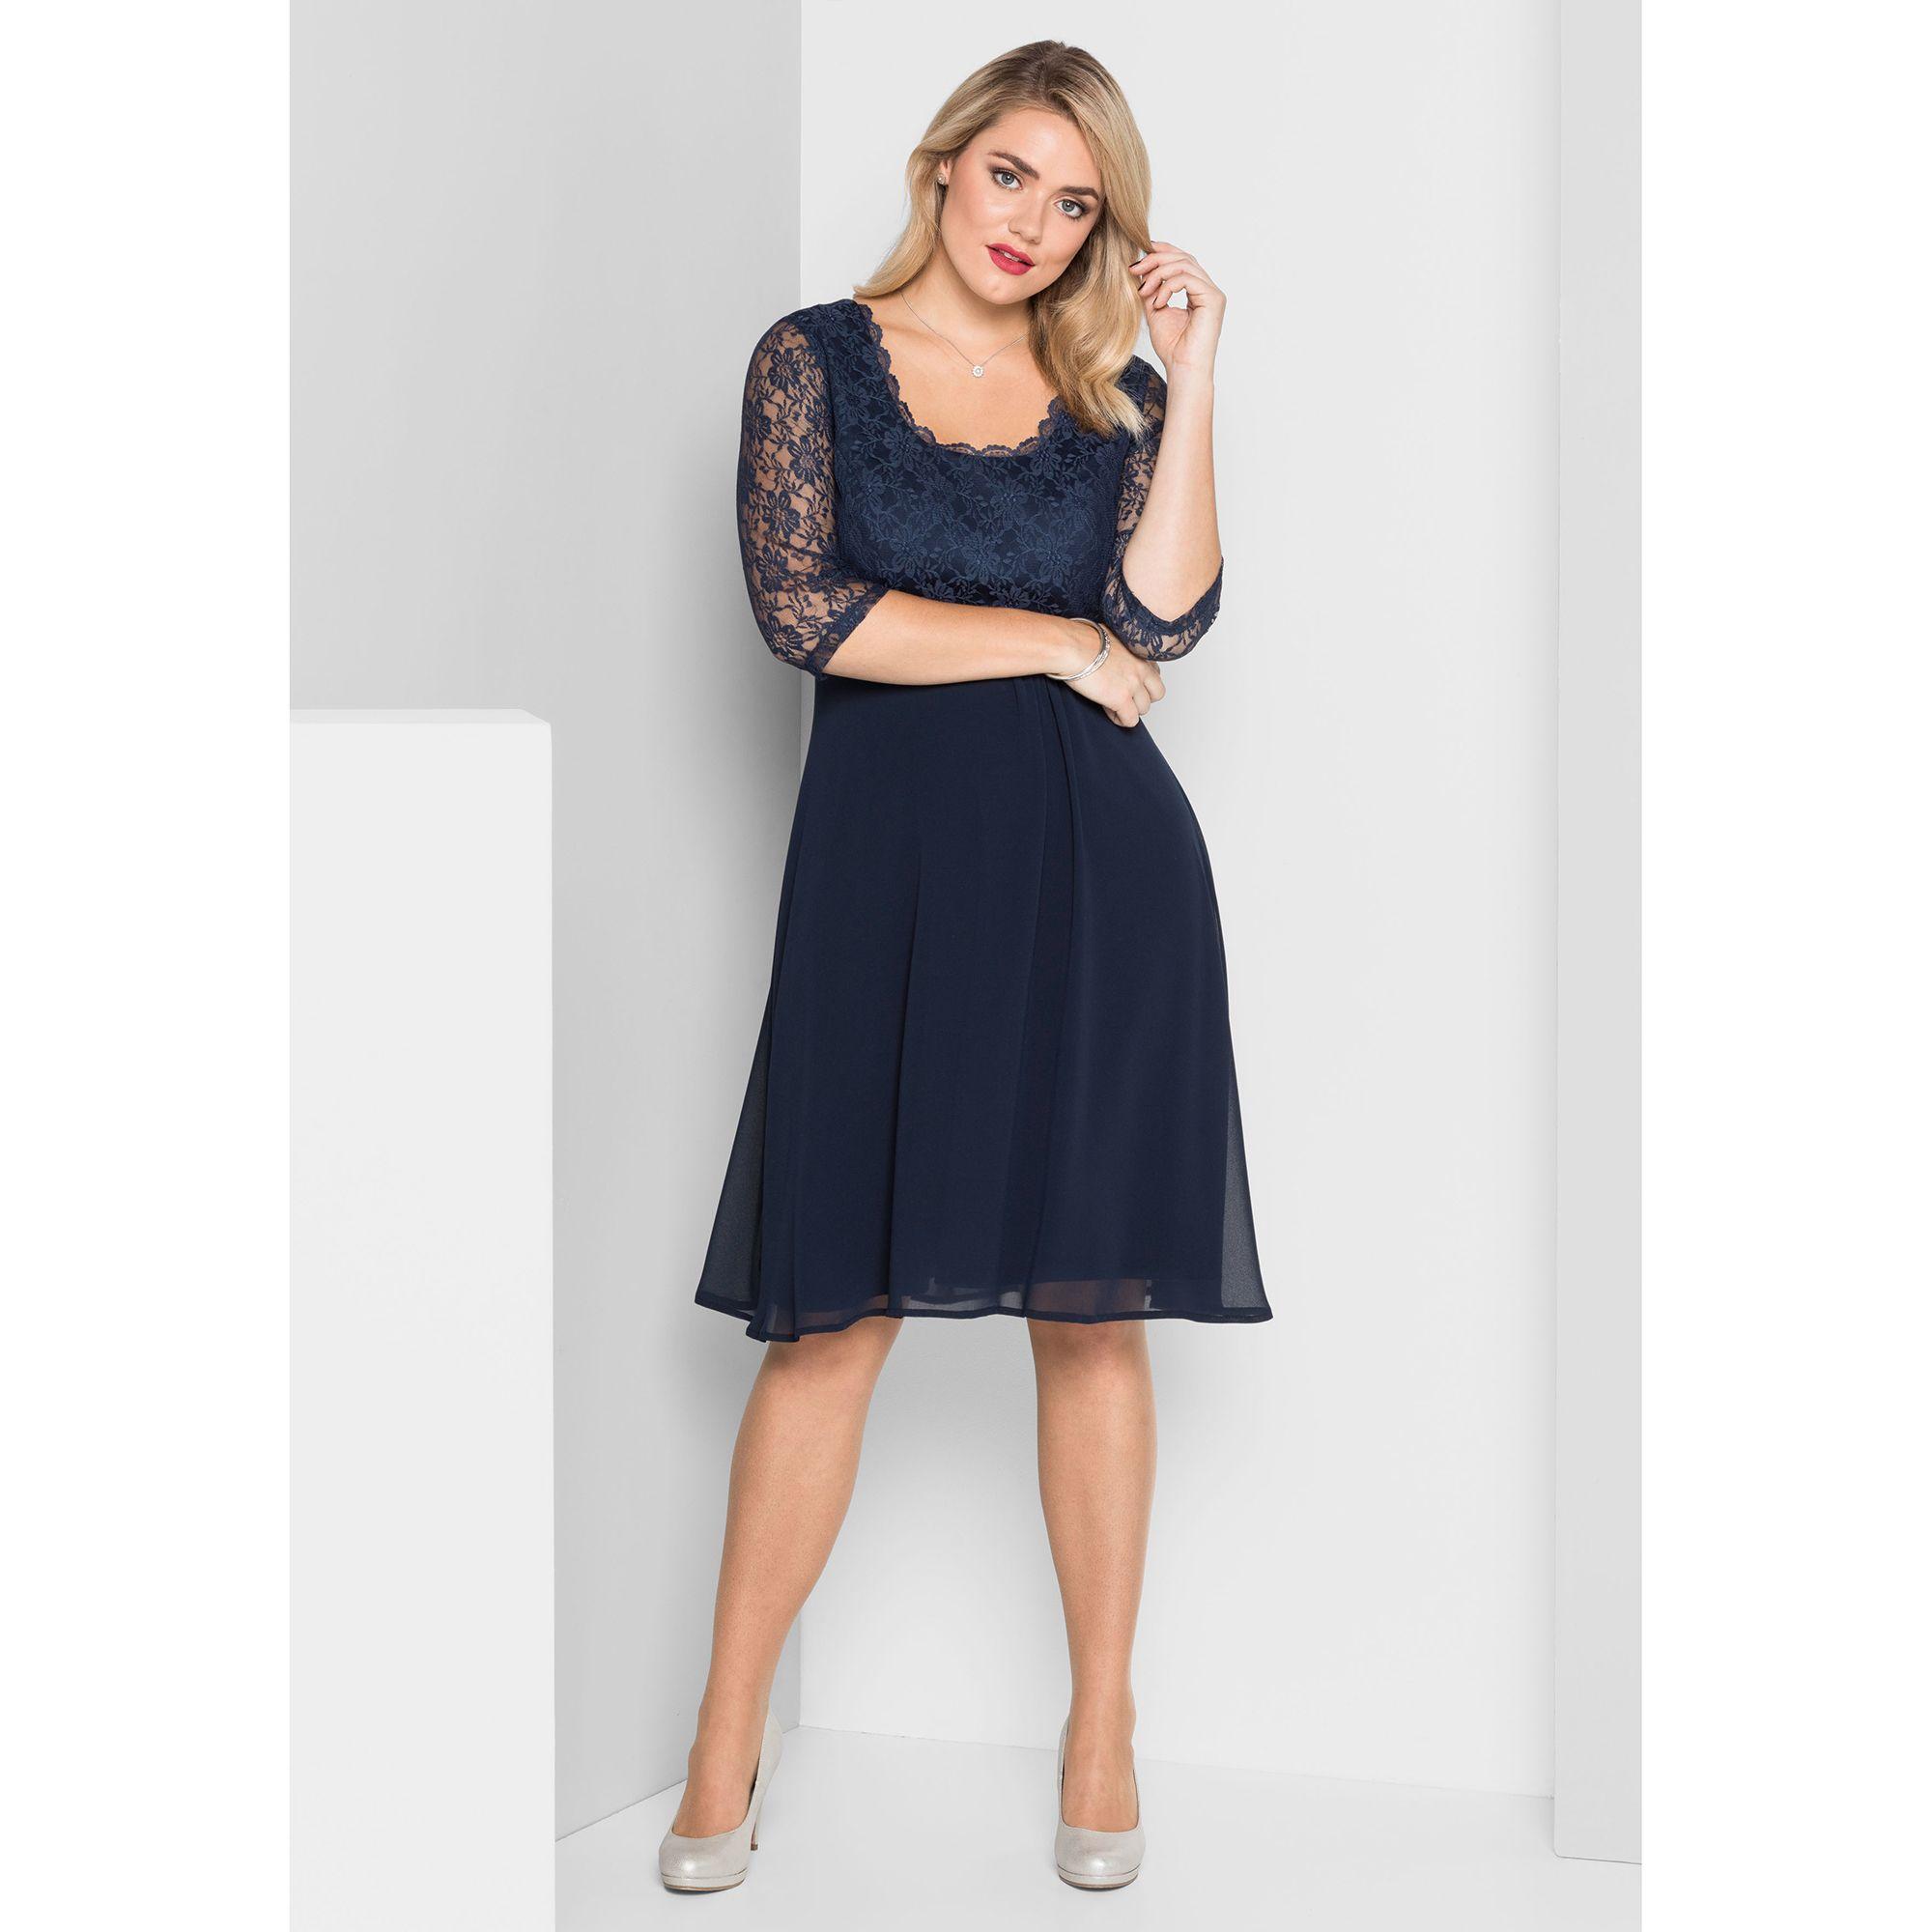 6363c0b609e sheego Kleid 3 4-Arm knieumspielend Spitze — QVC.de